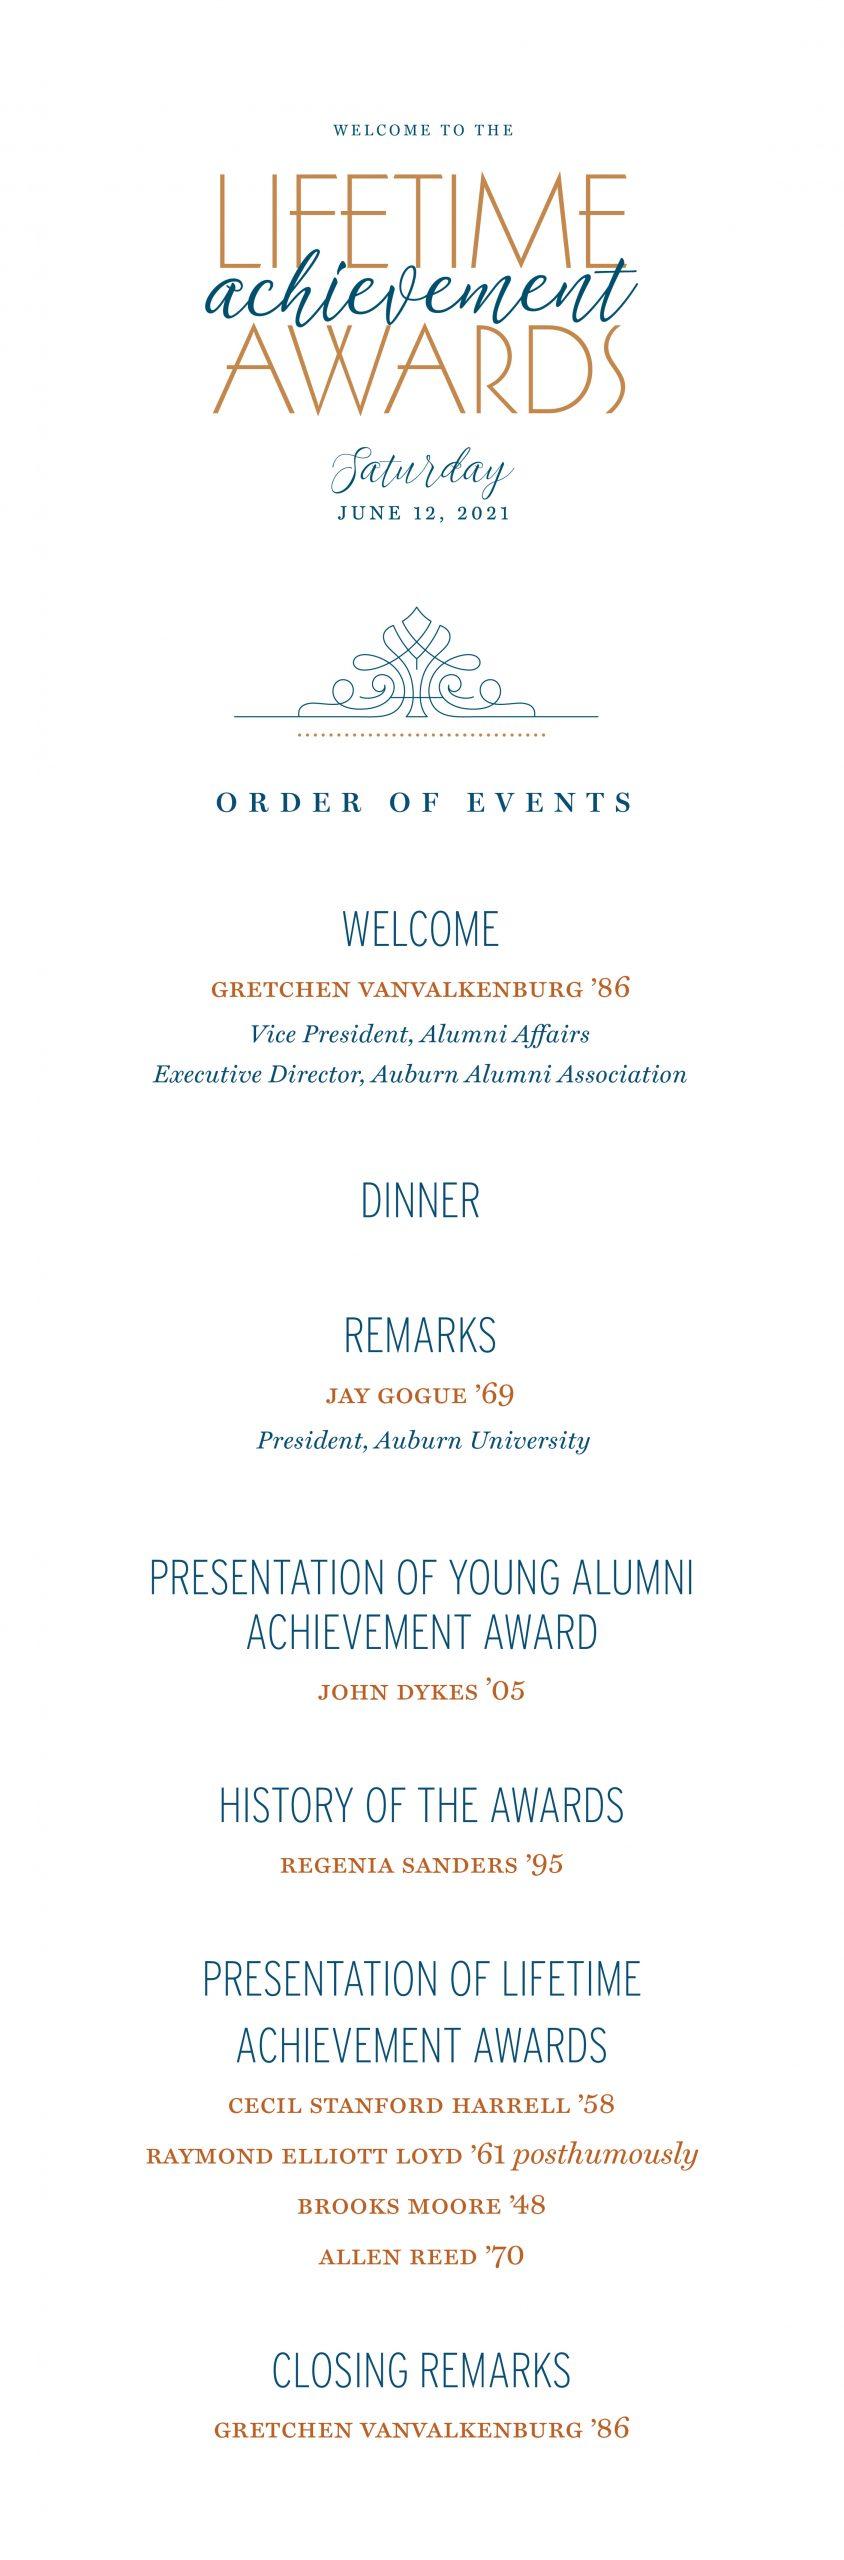 Lifetime Achievement Awards program